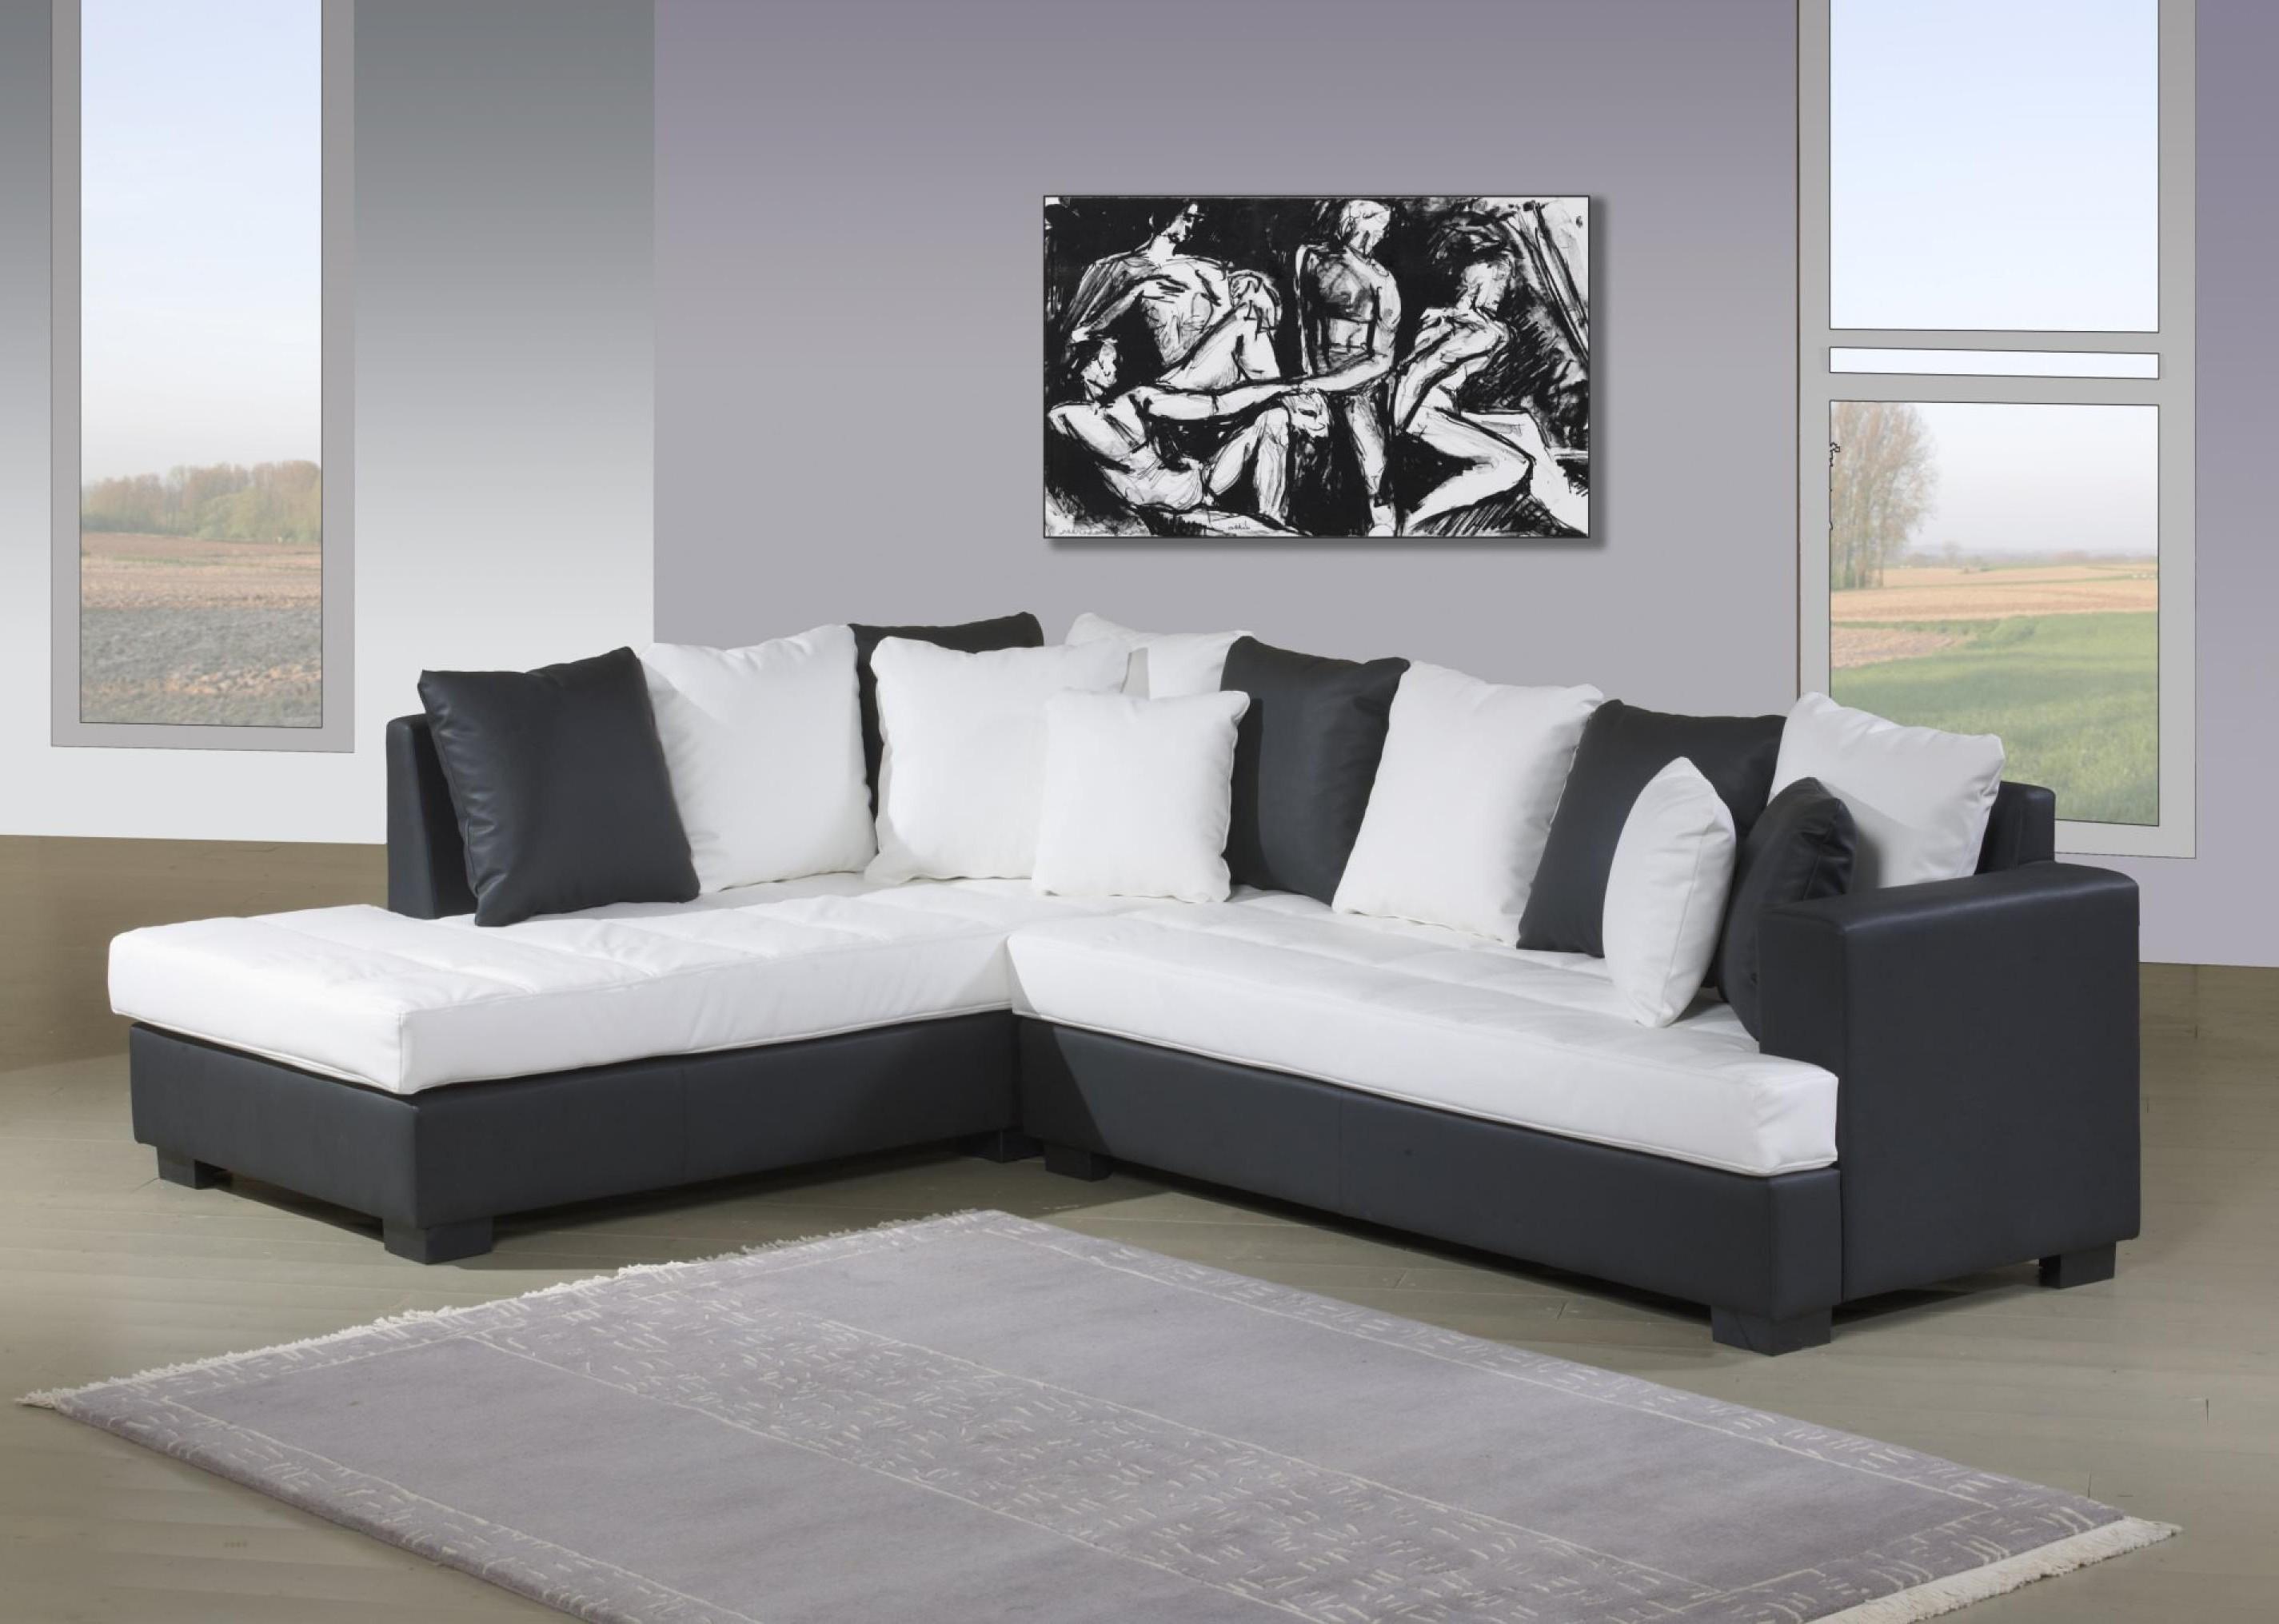 Canapé Gris Anthracite Ikea